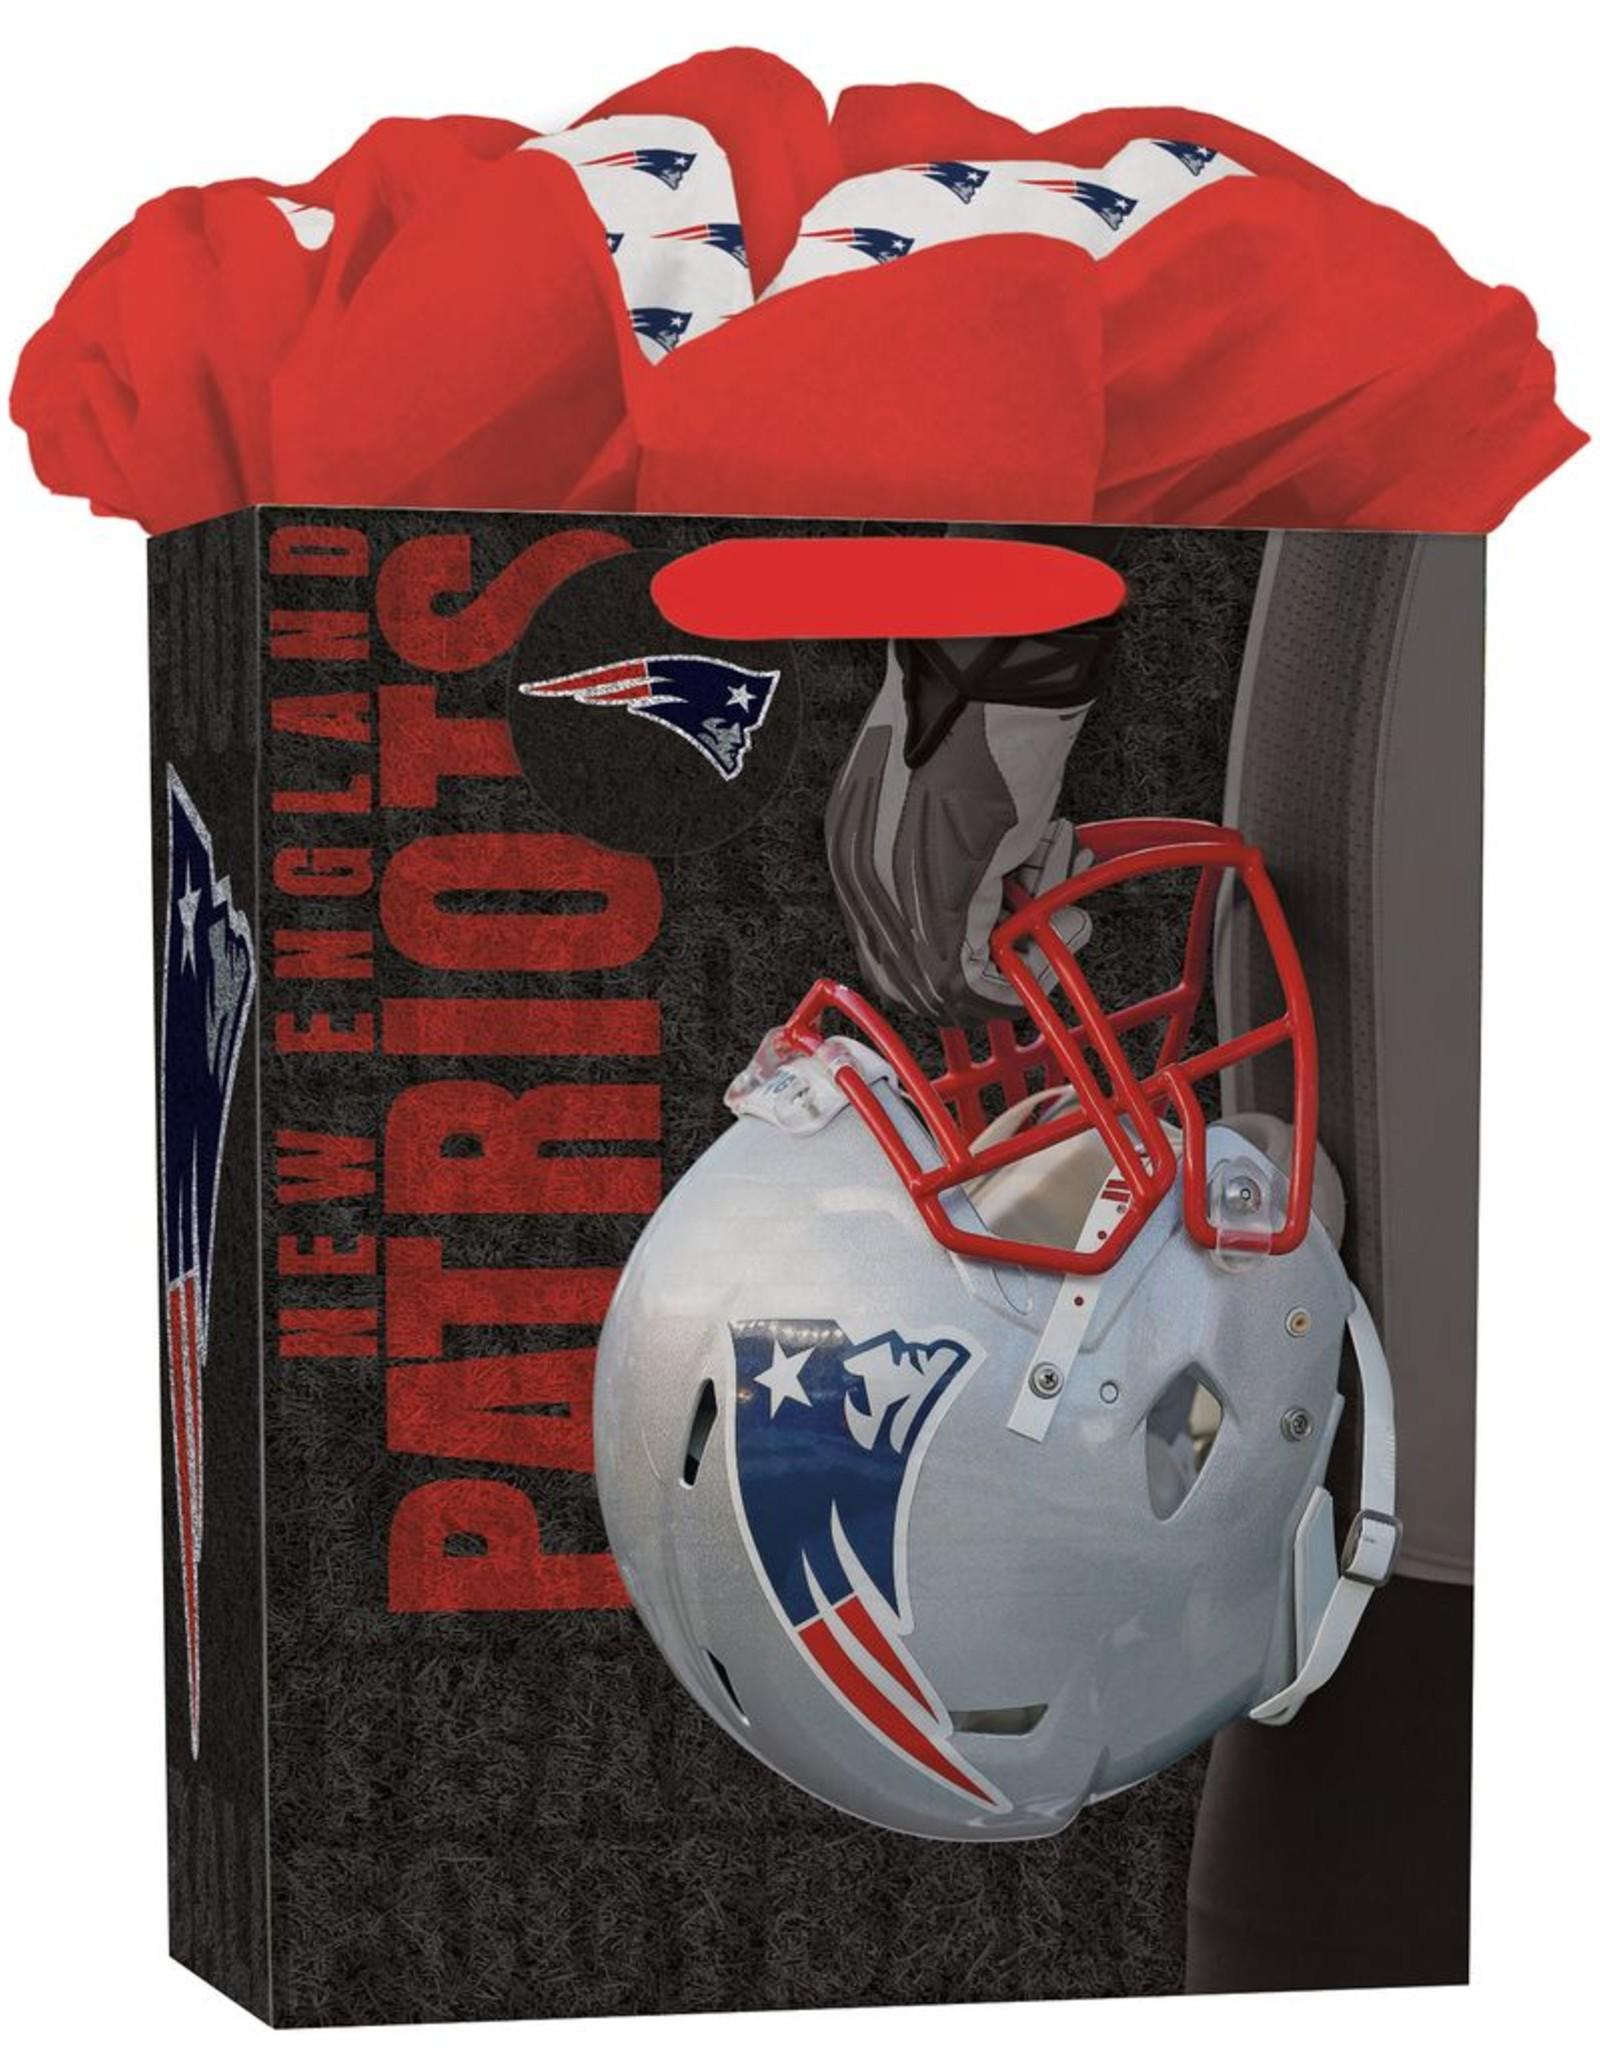 JF TURNER & CO New England Patriots Large GoGo Gift Bag